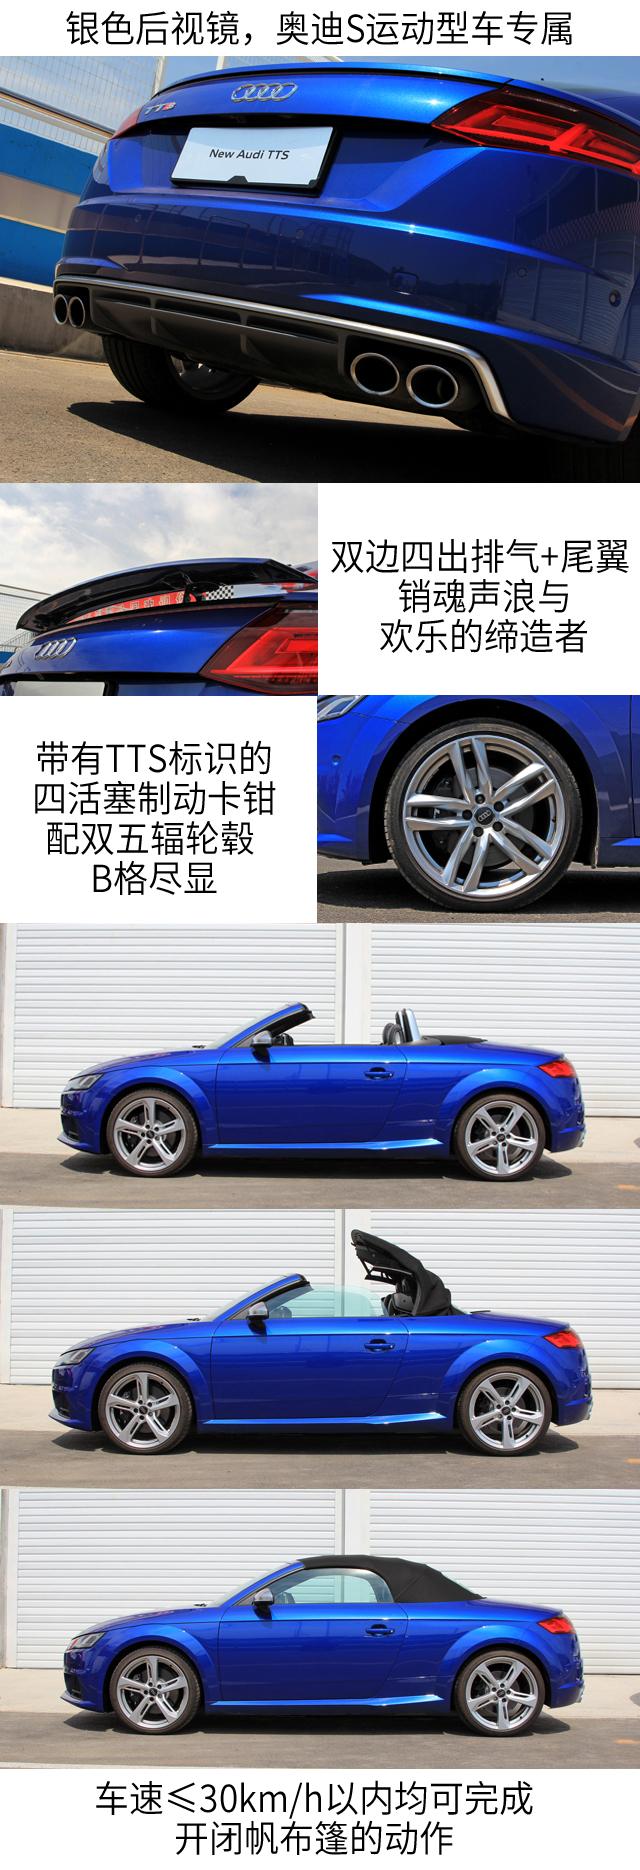 MR TRY|同价位叫板M2? 奥迪TTS嗨谷亮剑2